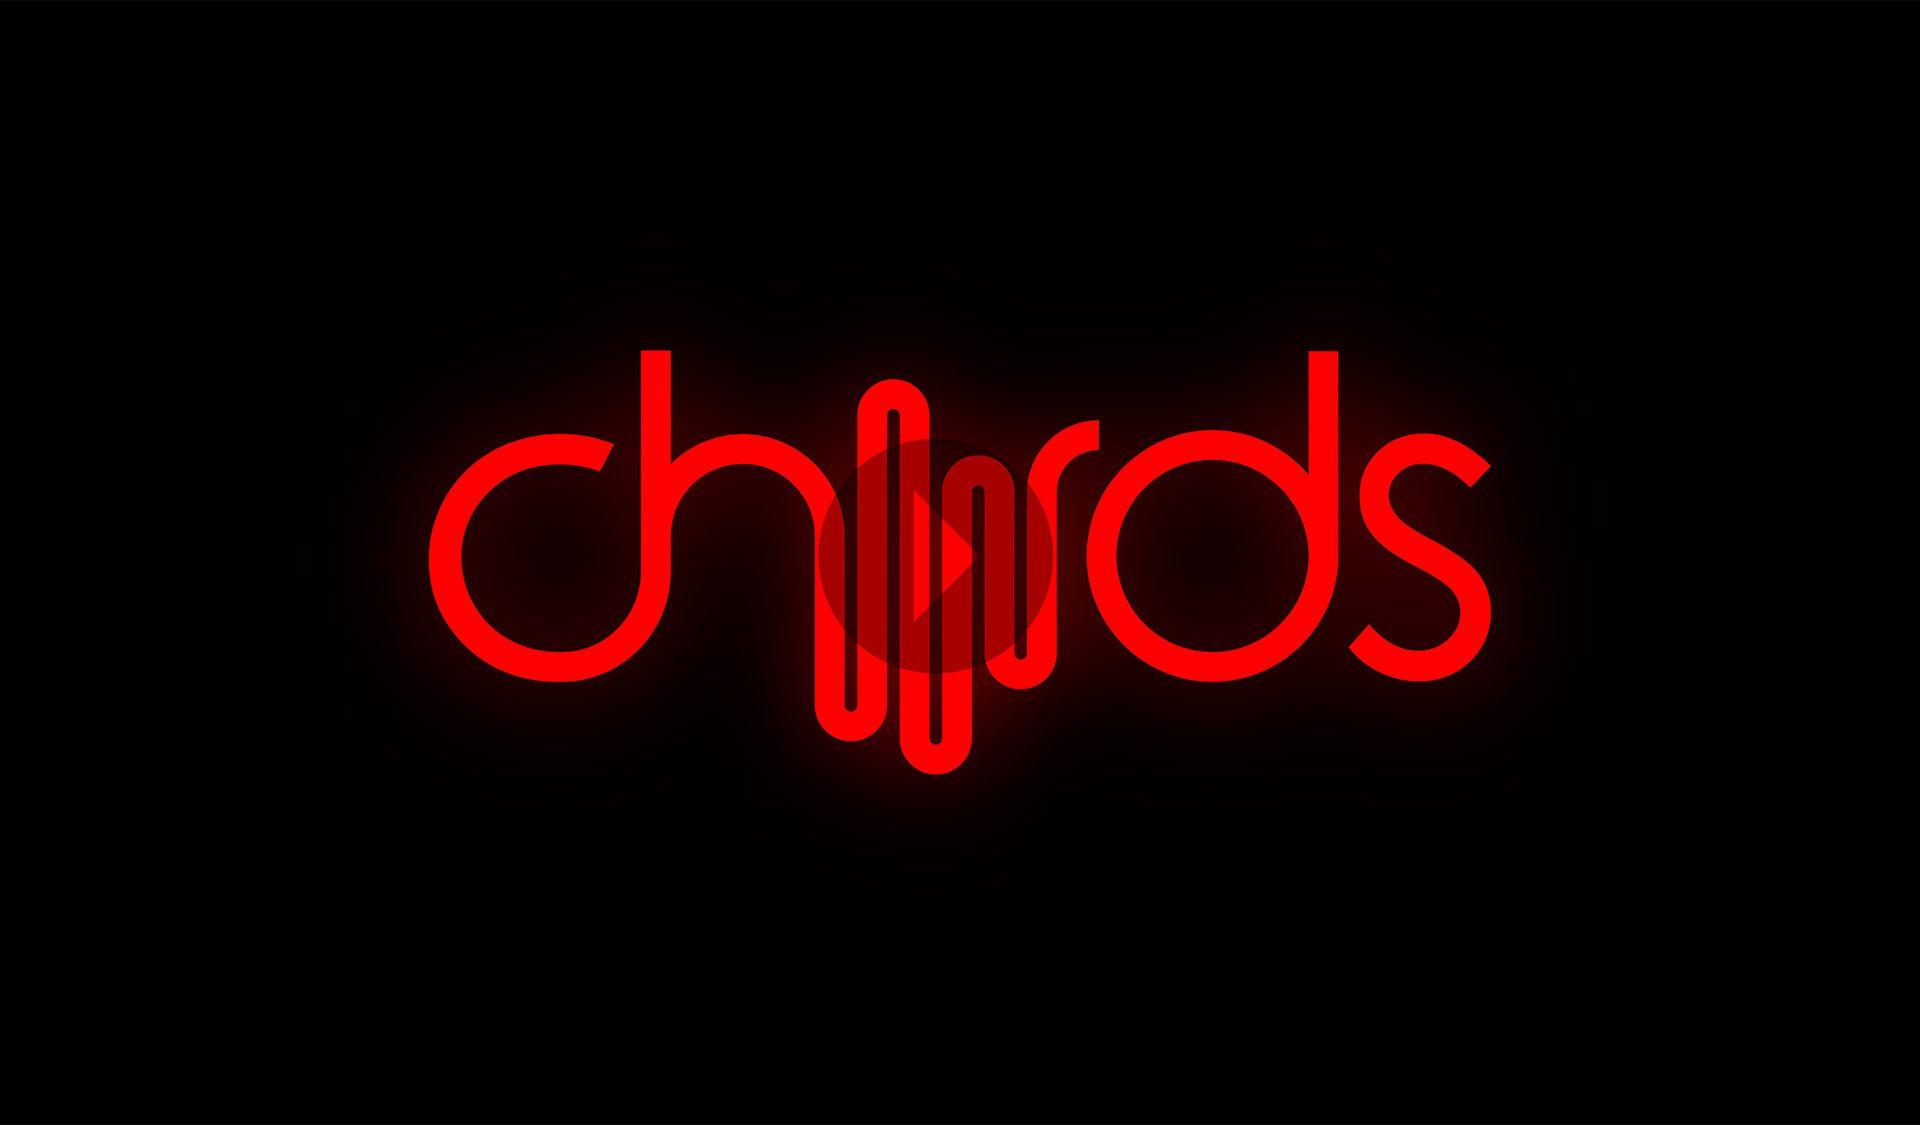 CHORDS 01